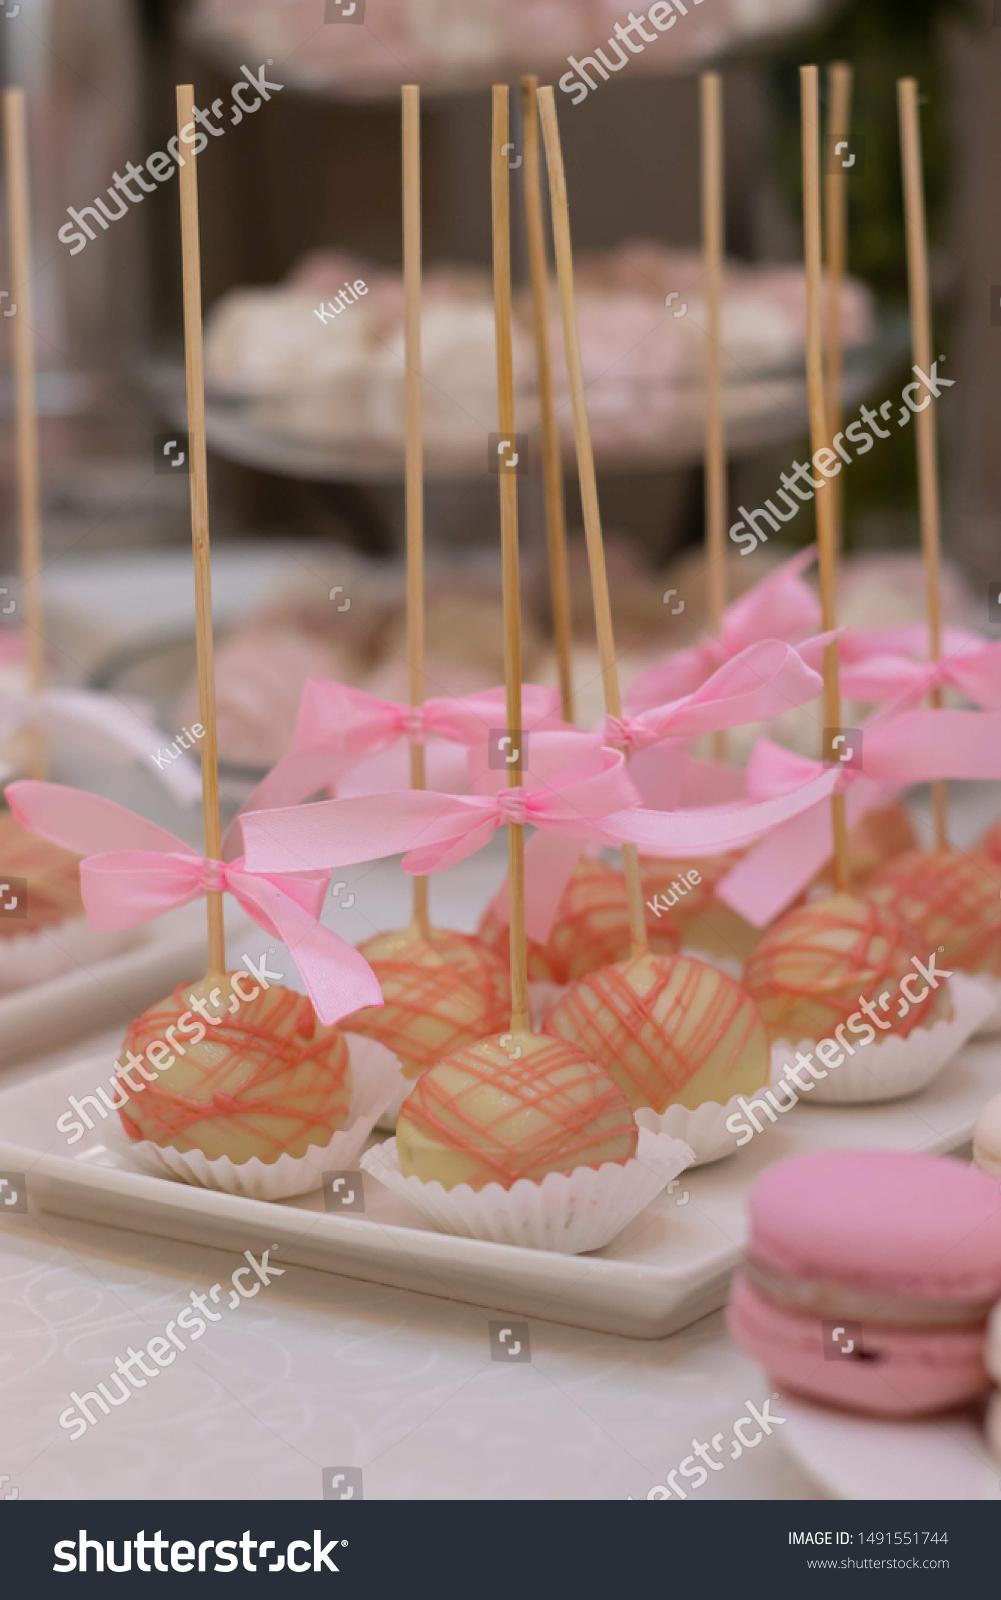 Macarons Sweet Desserts Wedding Wedding Sweet Food And Drink Stock Image 1491551744